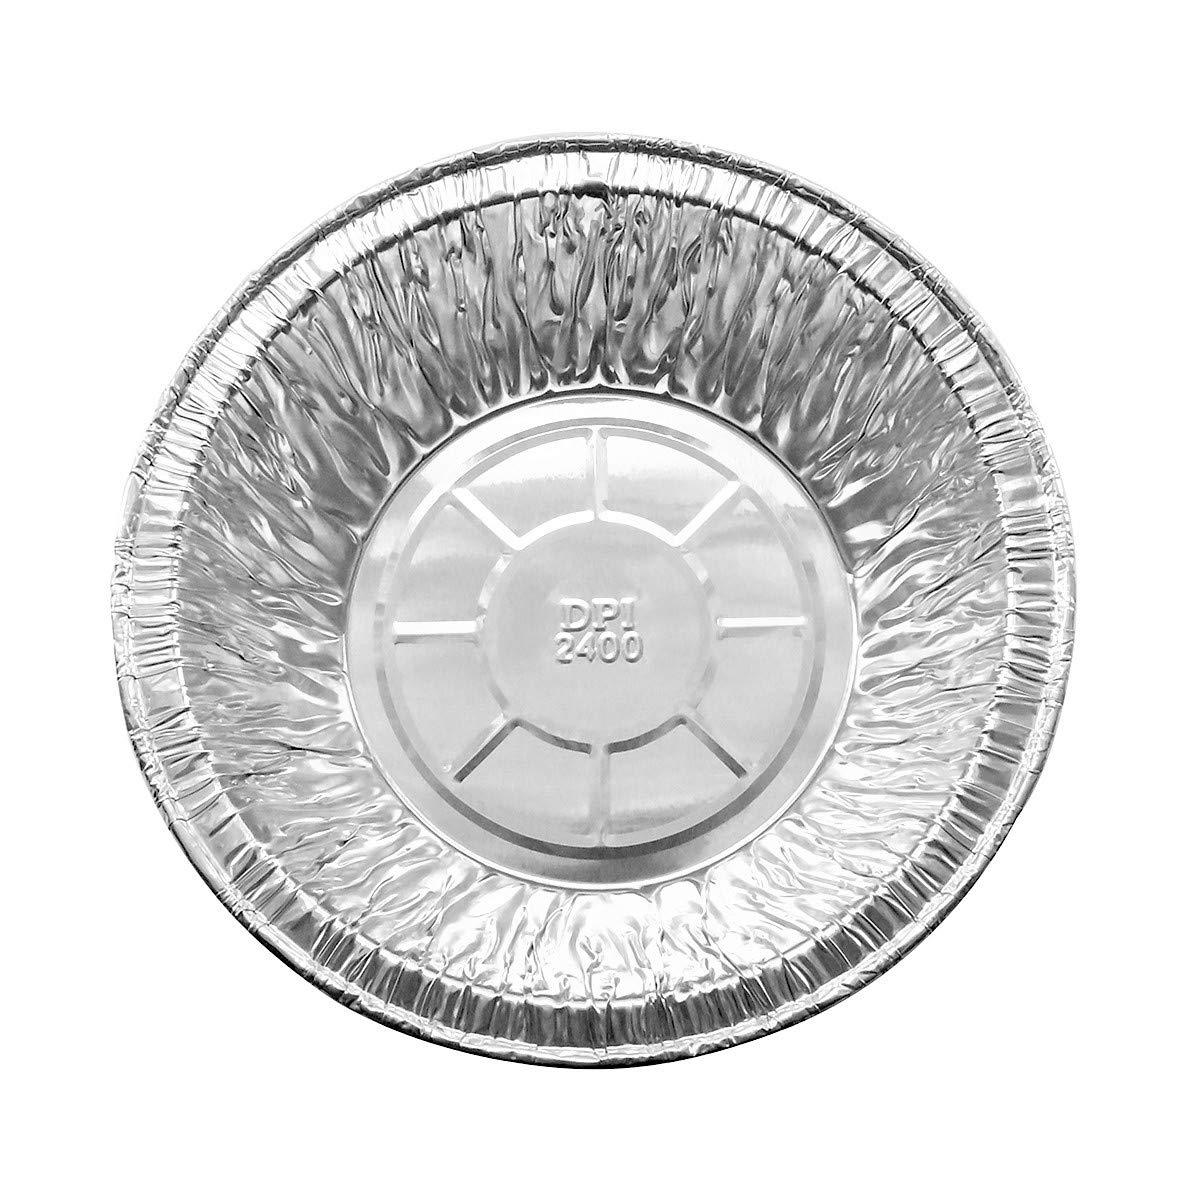 Disposable Aluminum 5 3/4 Extra Deep Meat/Pot Pie Pan #2400 (1,000) by KitchenDance (Image #1)